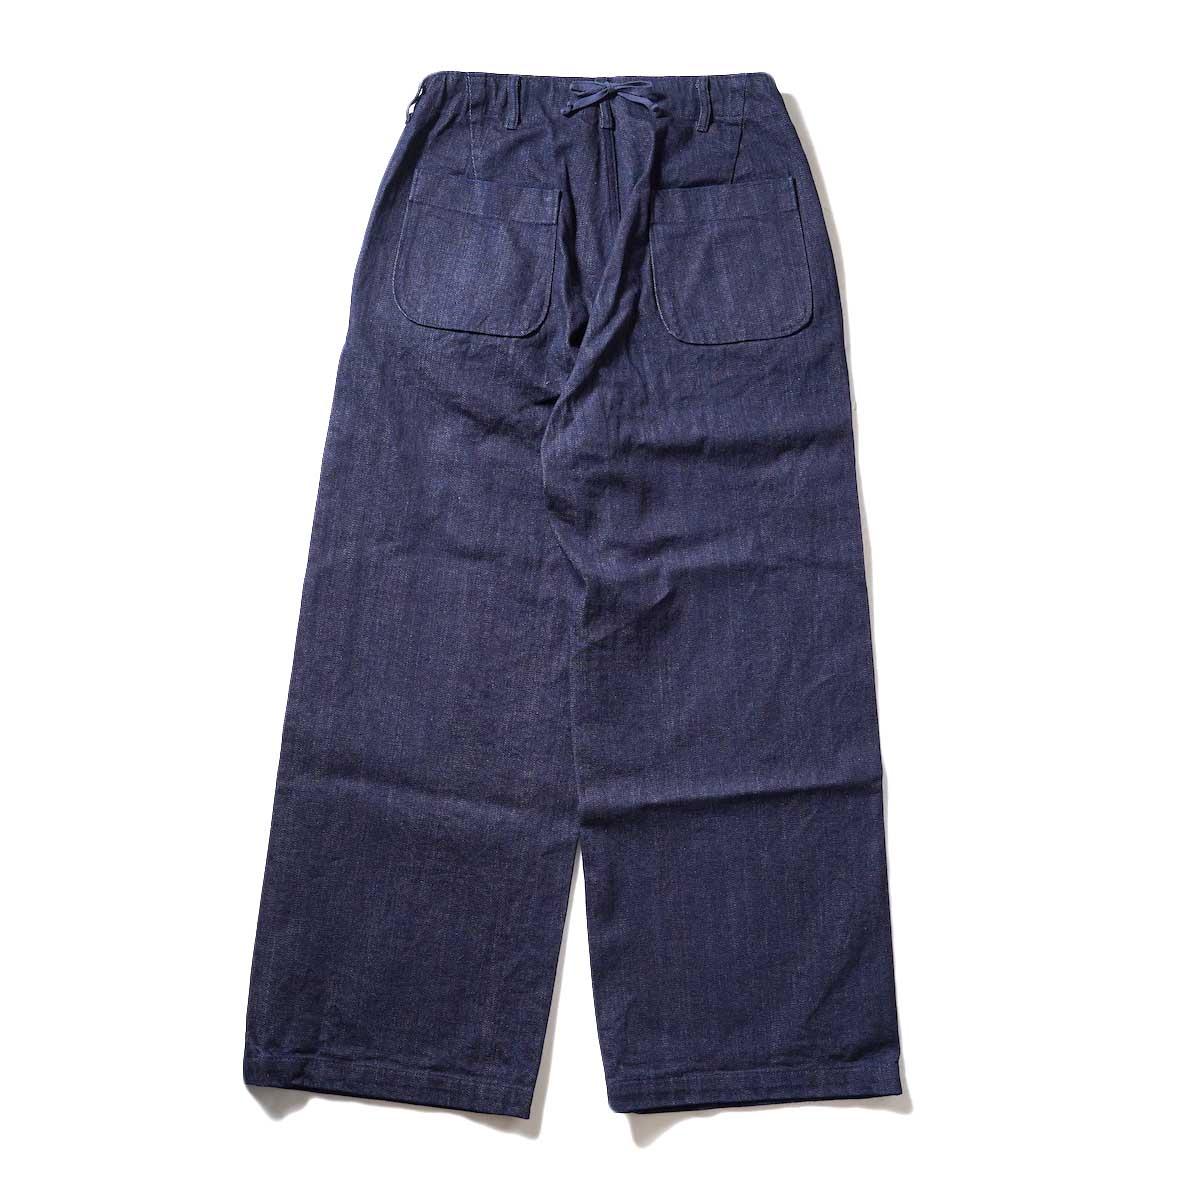 ENGINEERED GARMENTS / Sailor Pant (Indigo) 背面